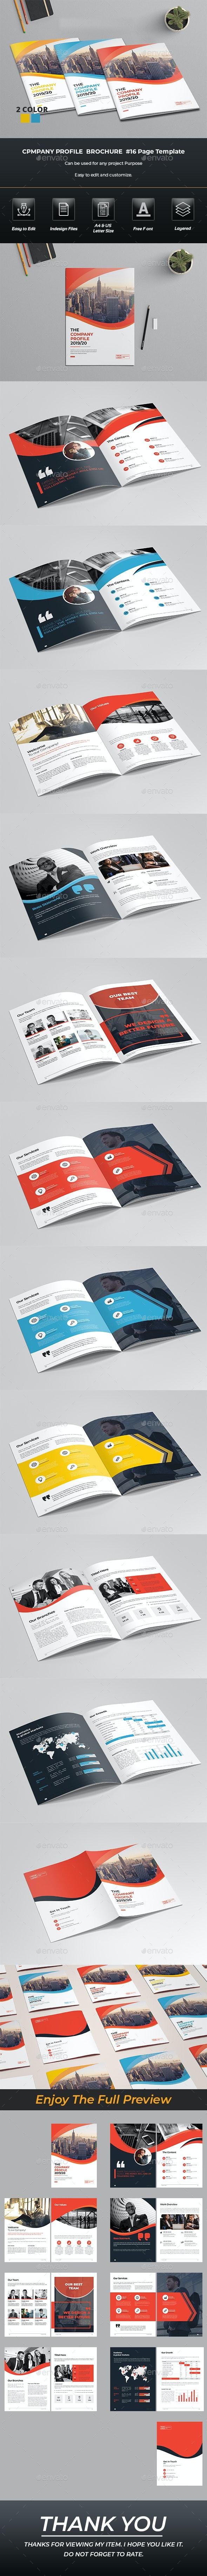 Business Profile Brochure Indesign Template - Brochures Print Templates